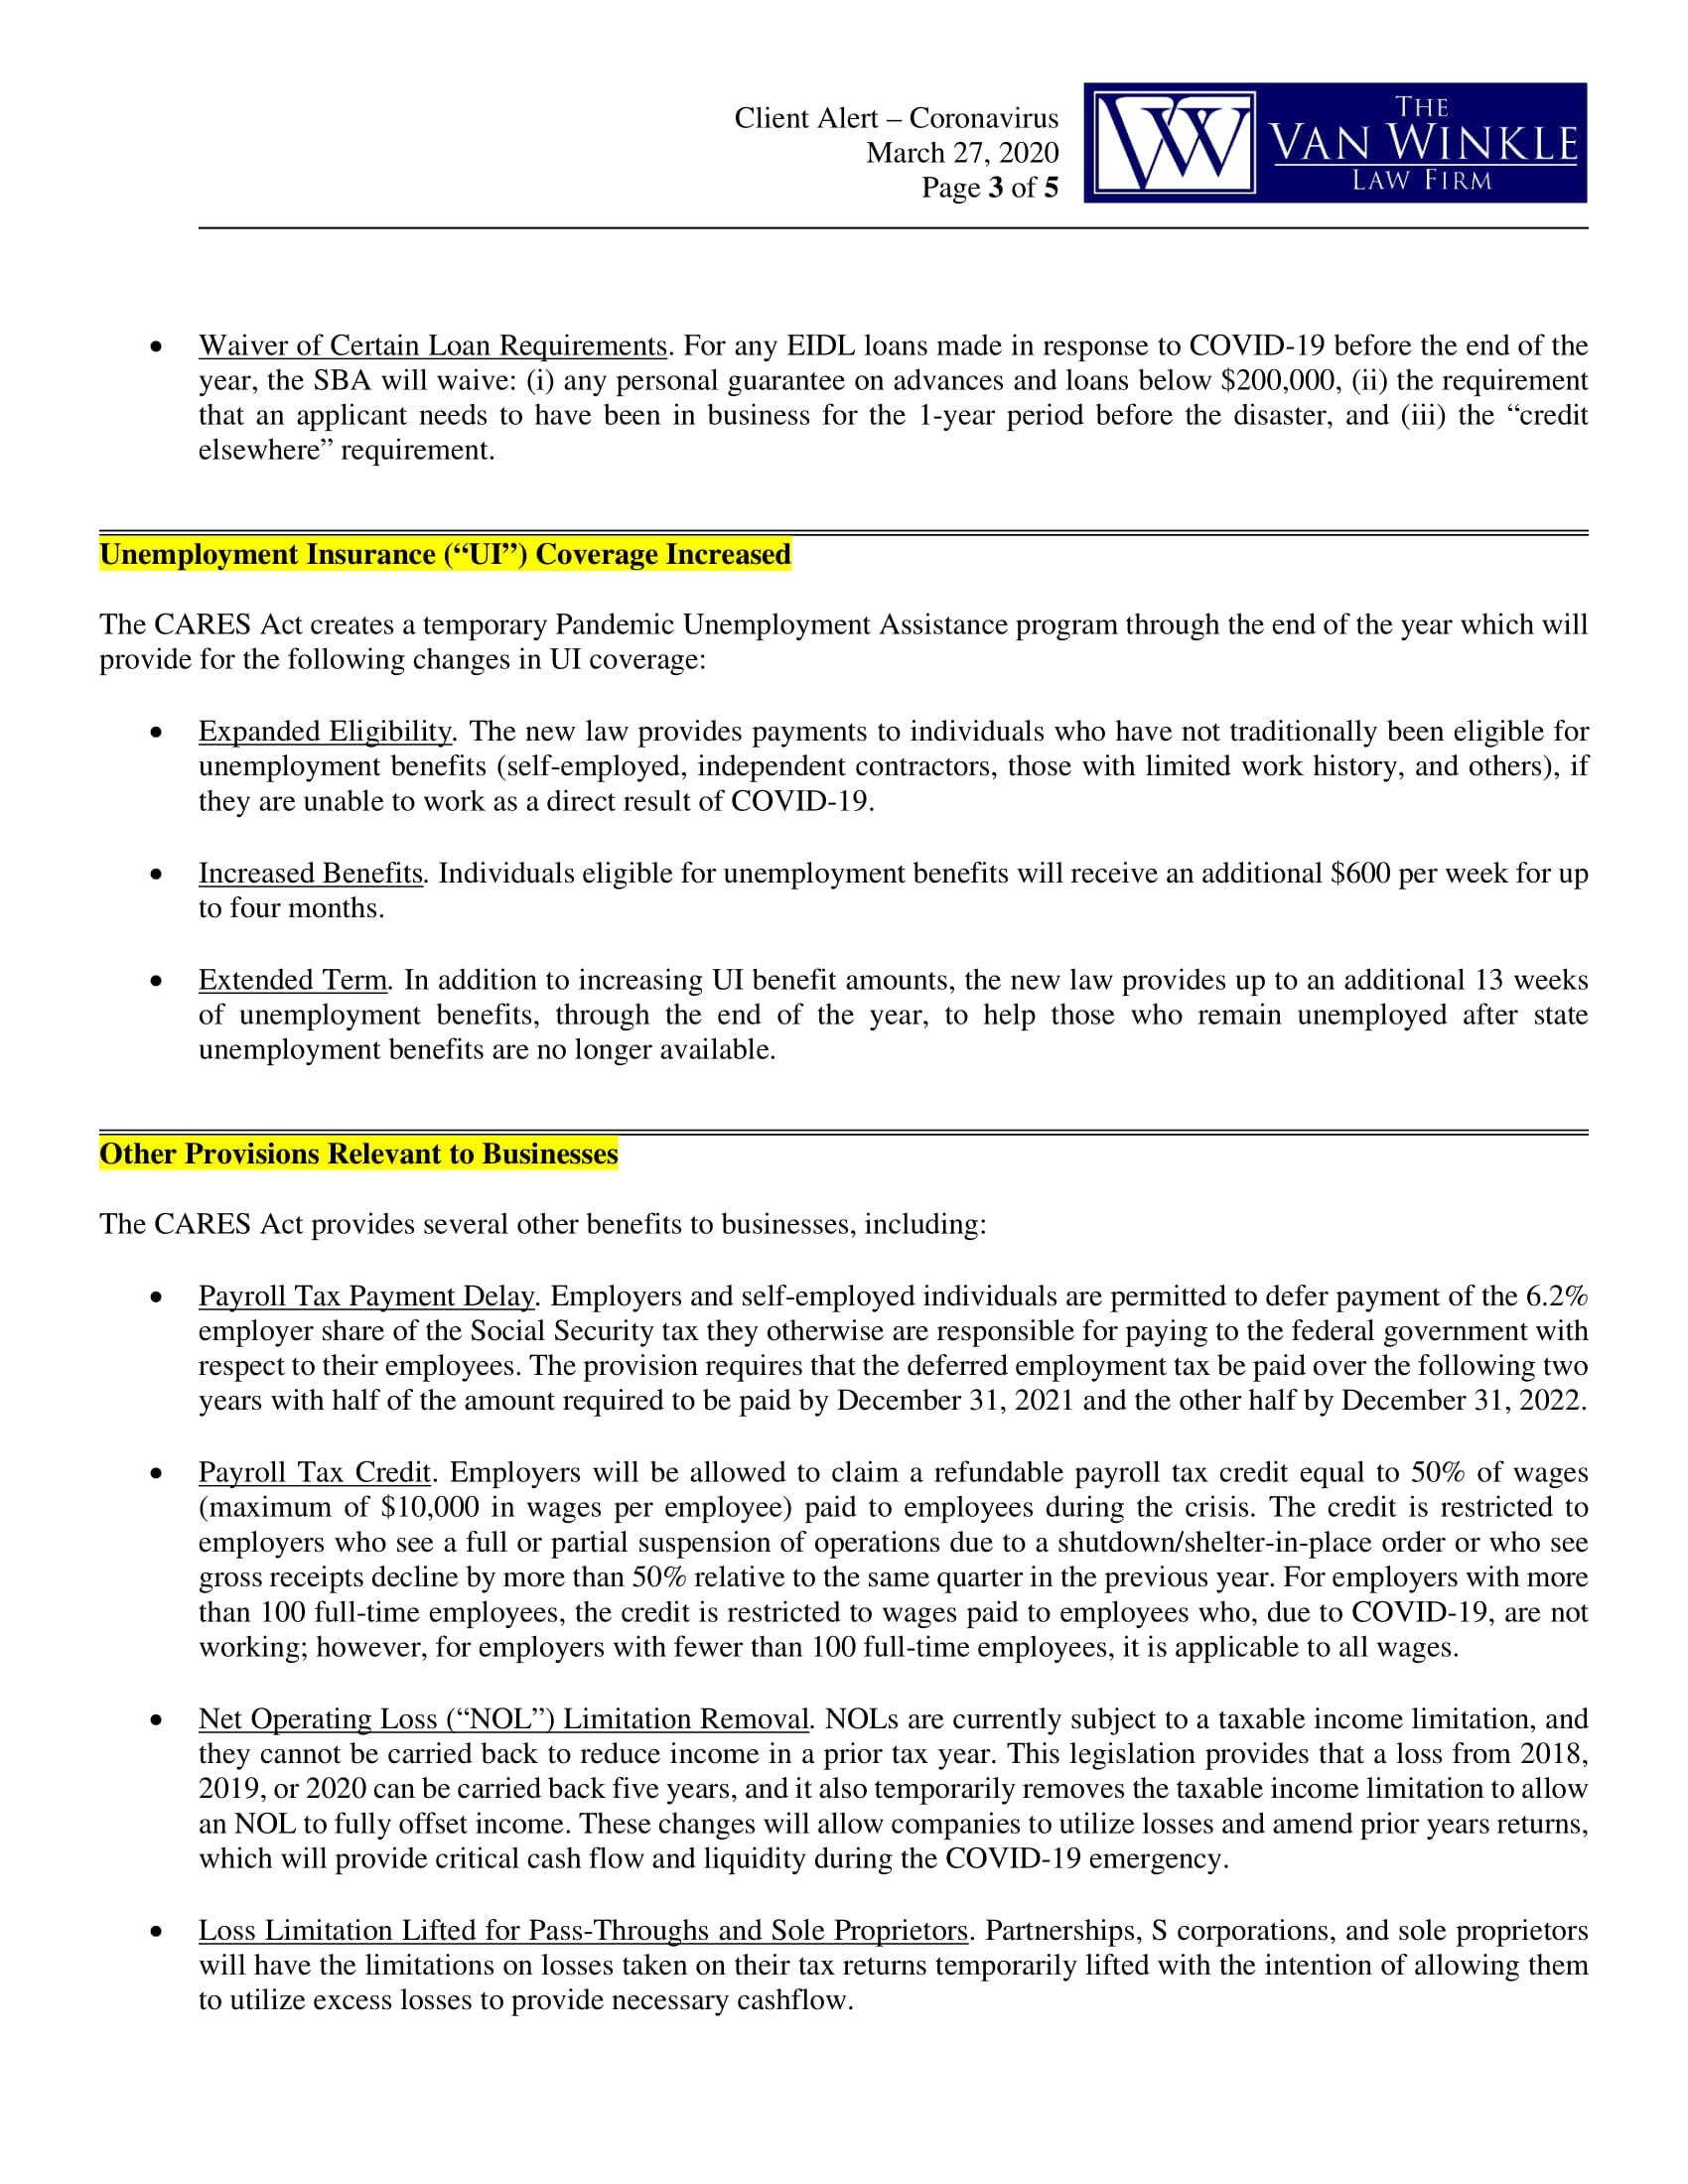 Phase 3 Coronavirus Relief Page 3